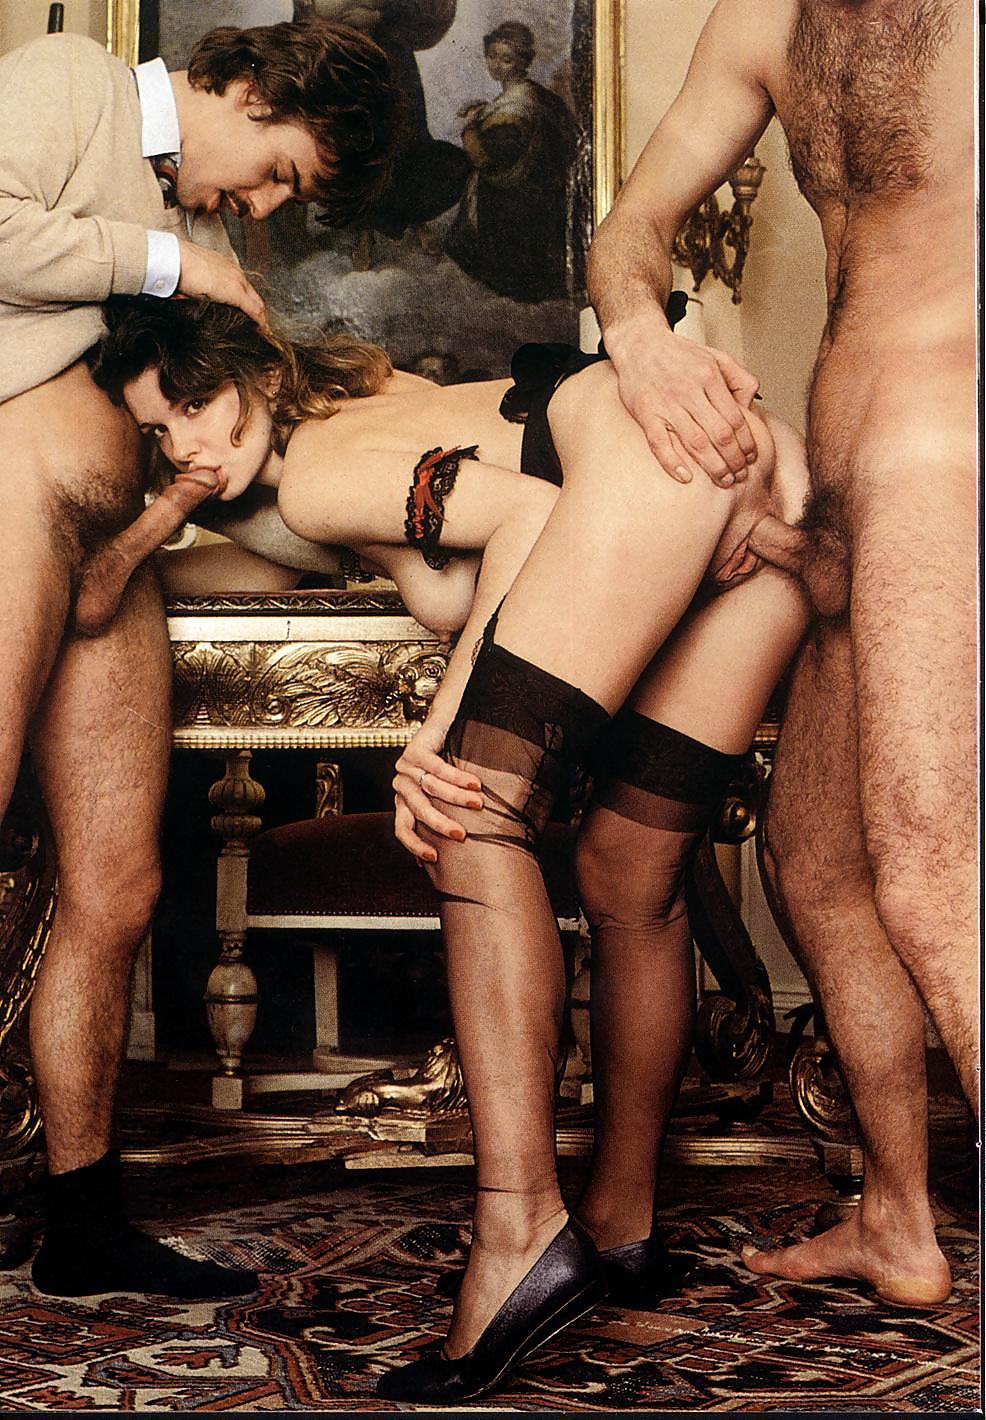 Фото красивых ретро порно групповуха анал пизда